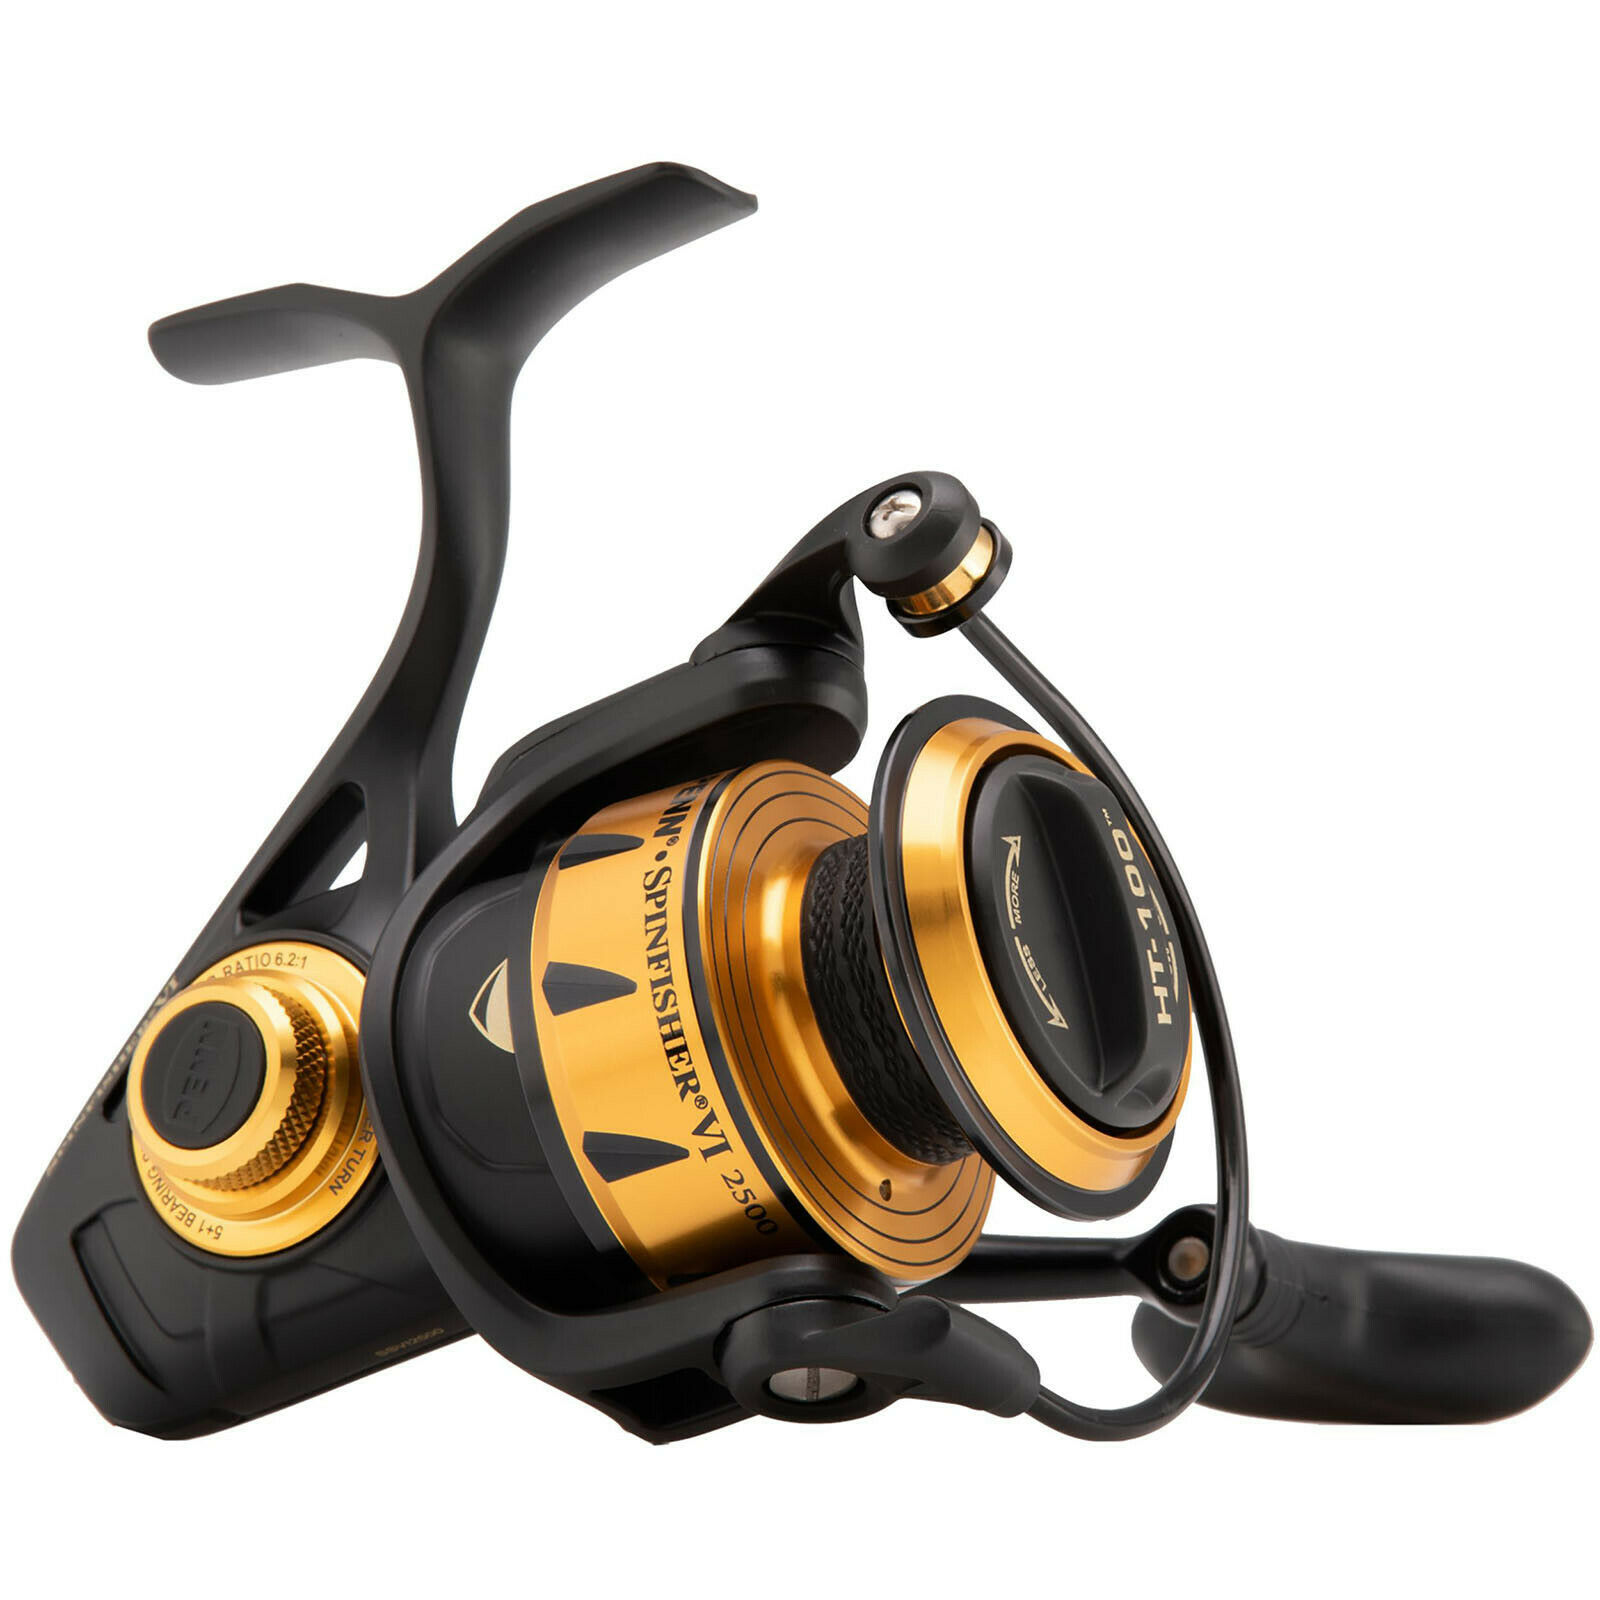 Penn Spinfisher SSVI 2500 Saltwater Spinning Fishing Reel - SSVI2500   outlet online